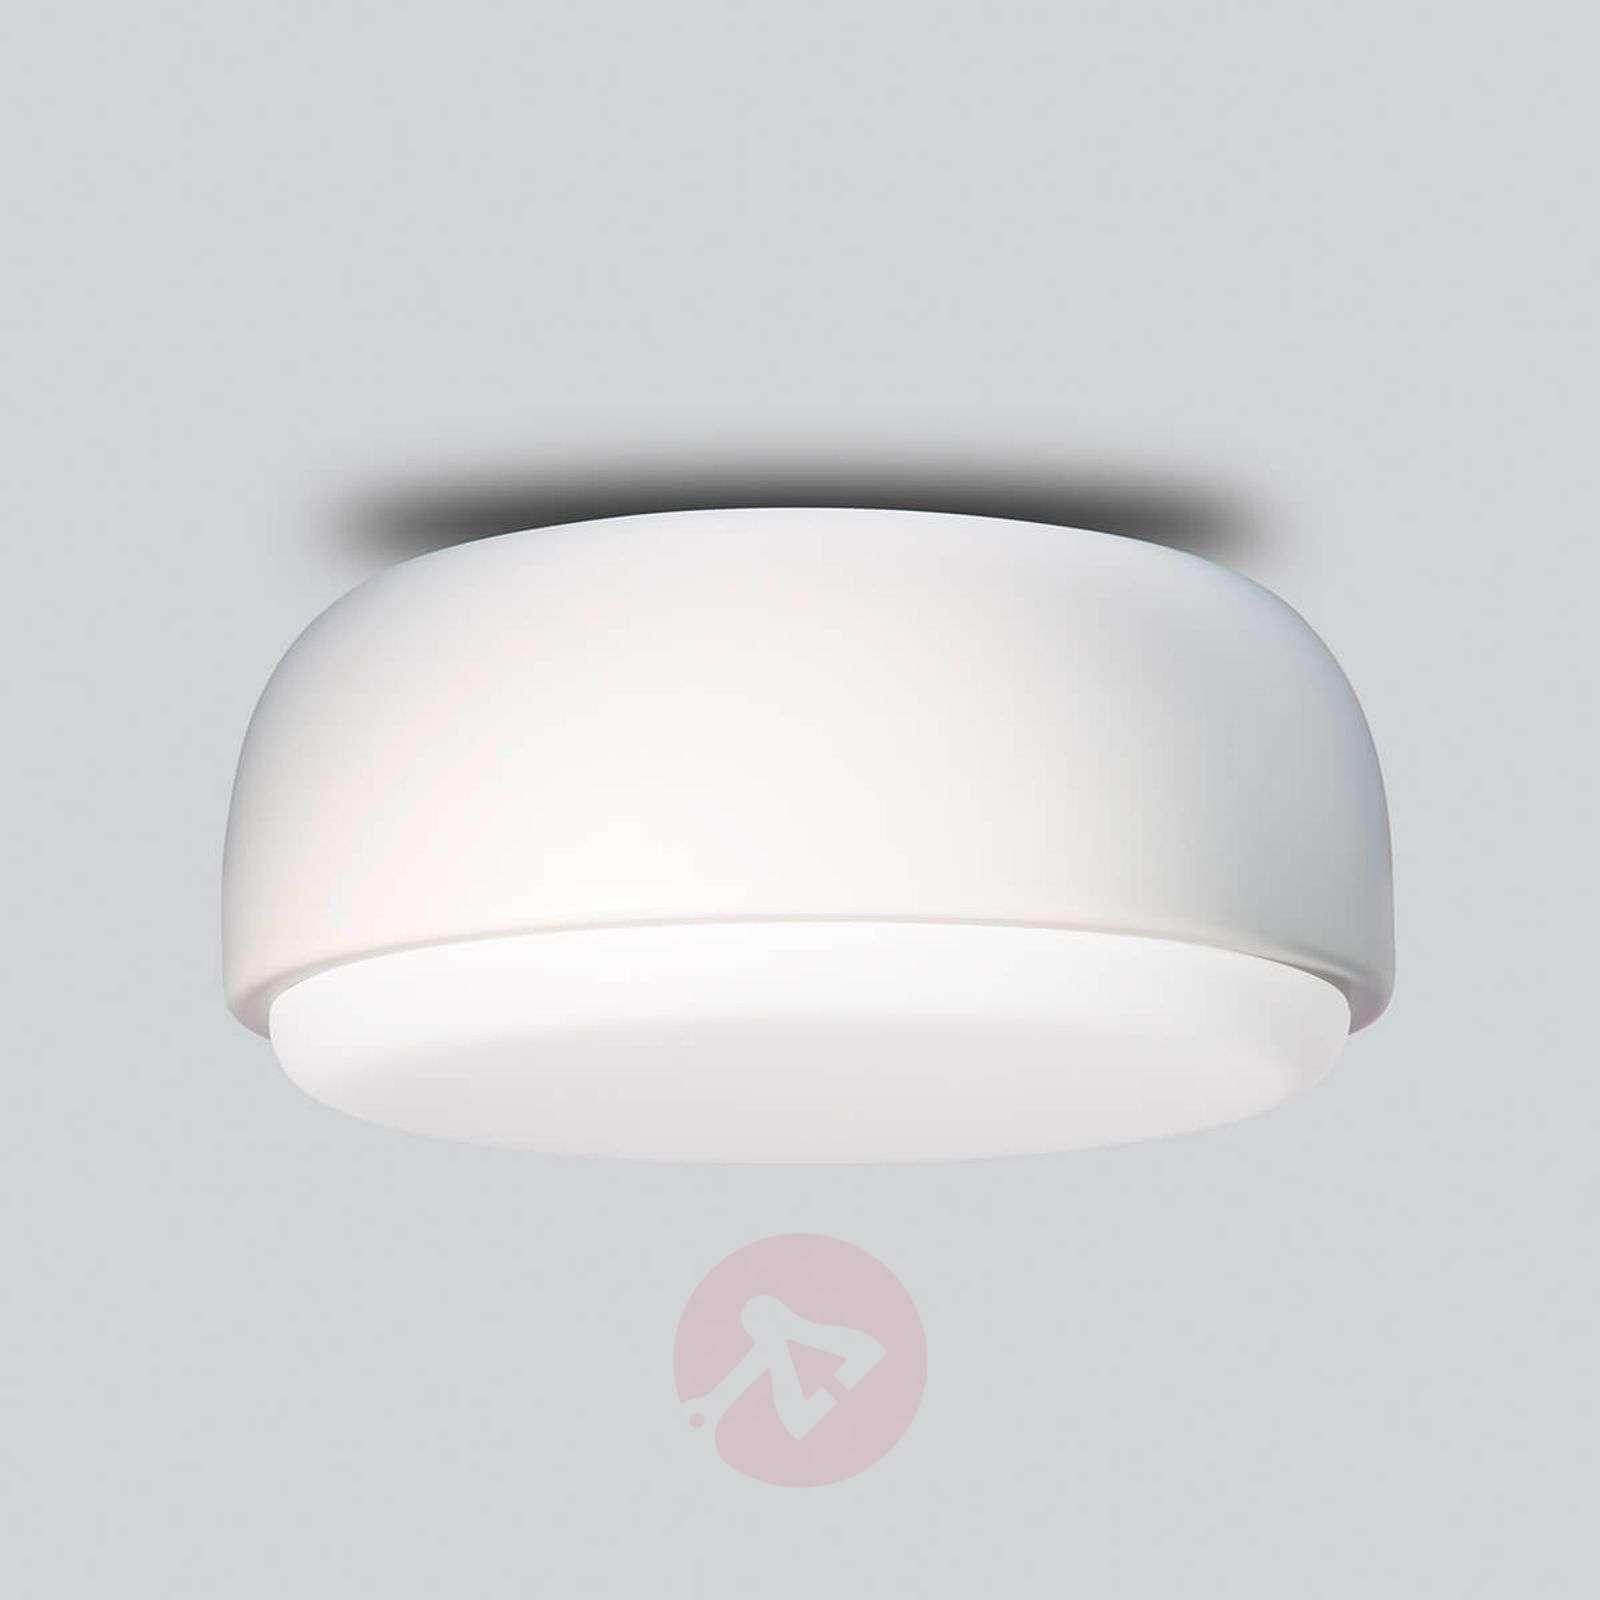 Valkoinen design-kattovalaisin Over Me, 30cm-7013091-01